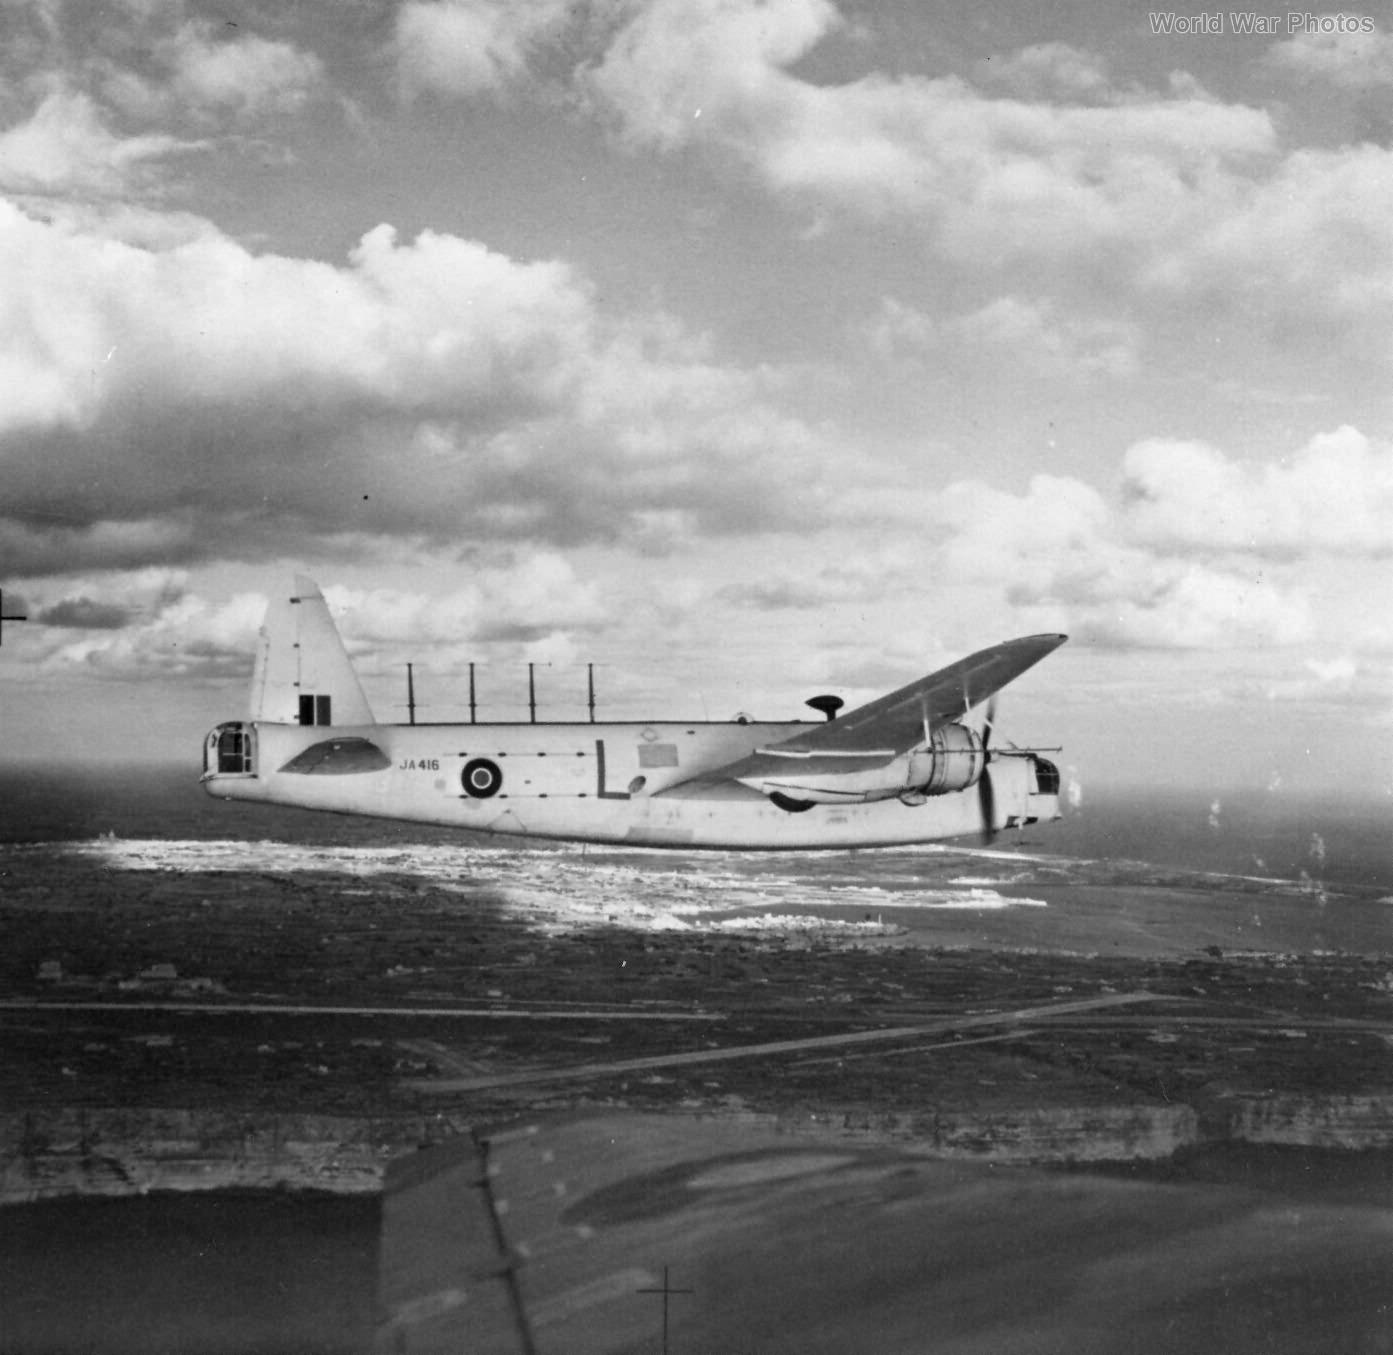 Wellington XIII over Malta